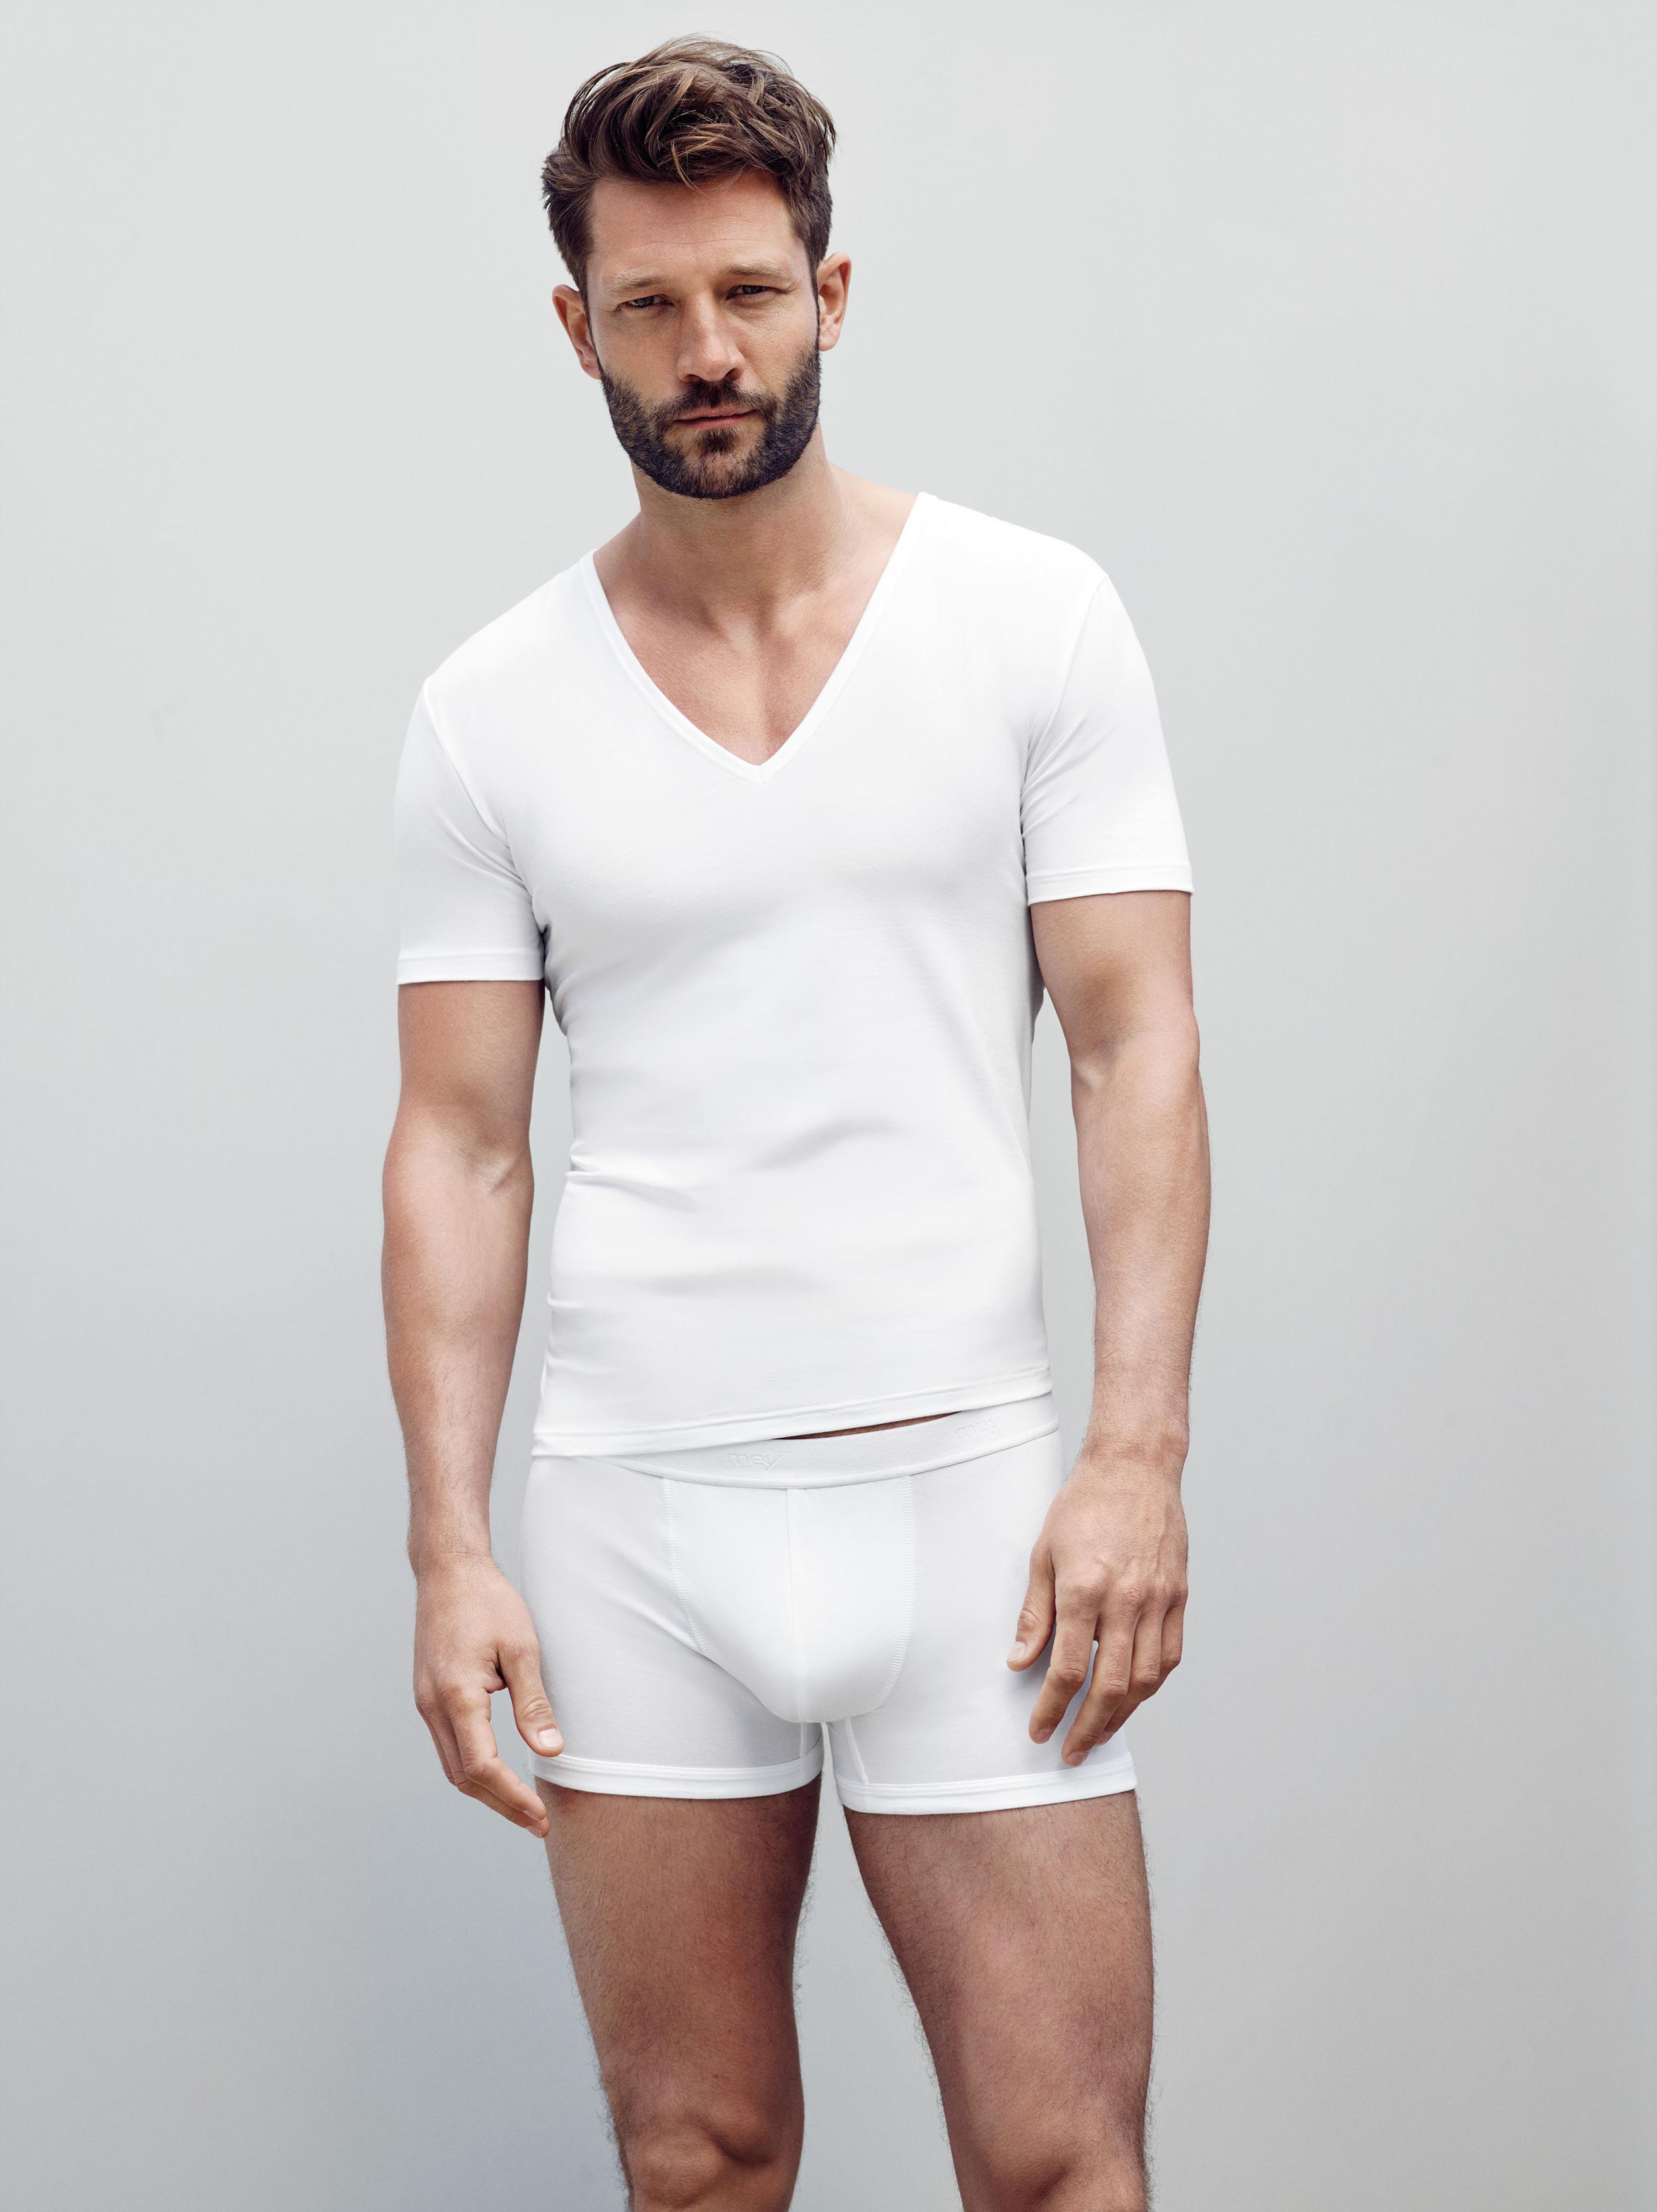 mey_bodywear_rgb_Mey_Basics_Dry_Cotton_Functional_Das_Drunterhemd_46038_Die_Drunterhose_46028.jpg